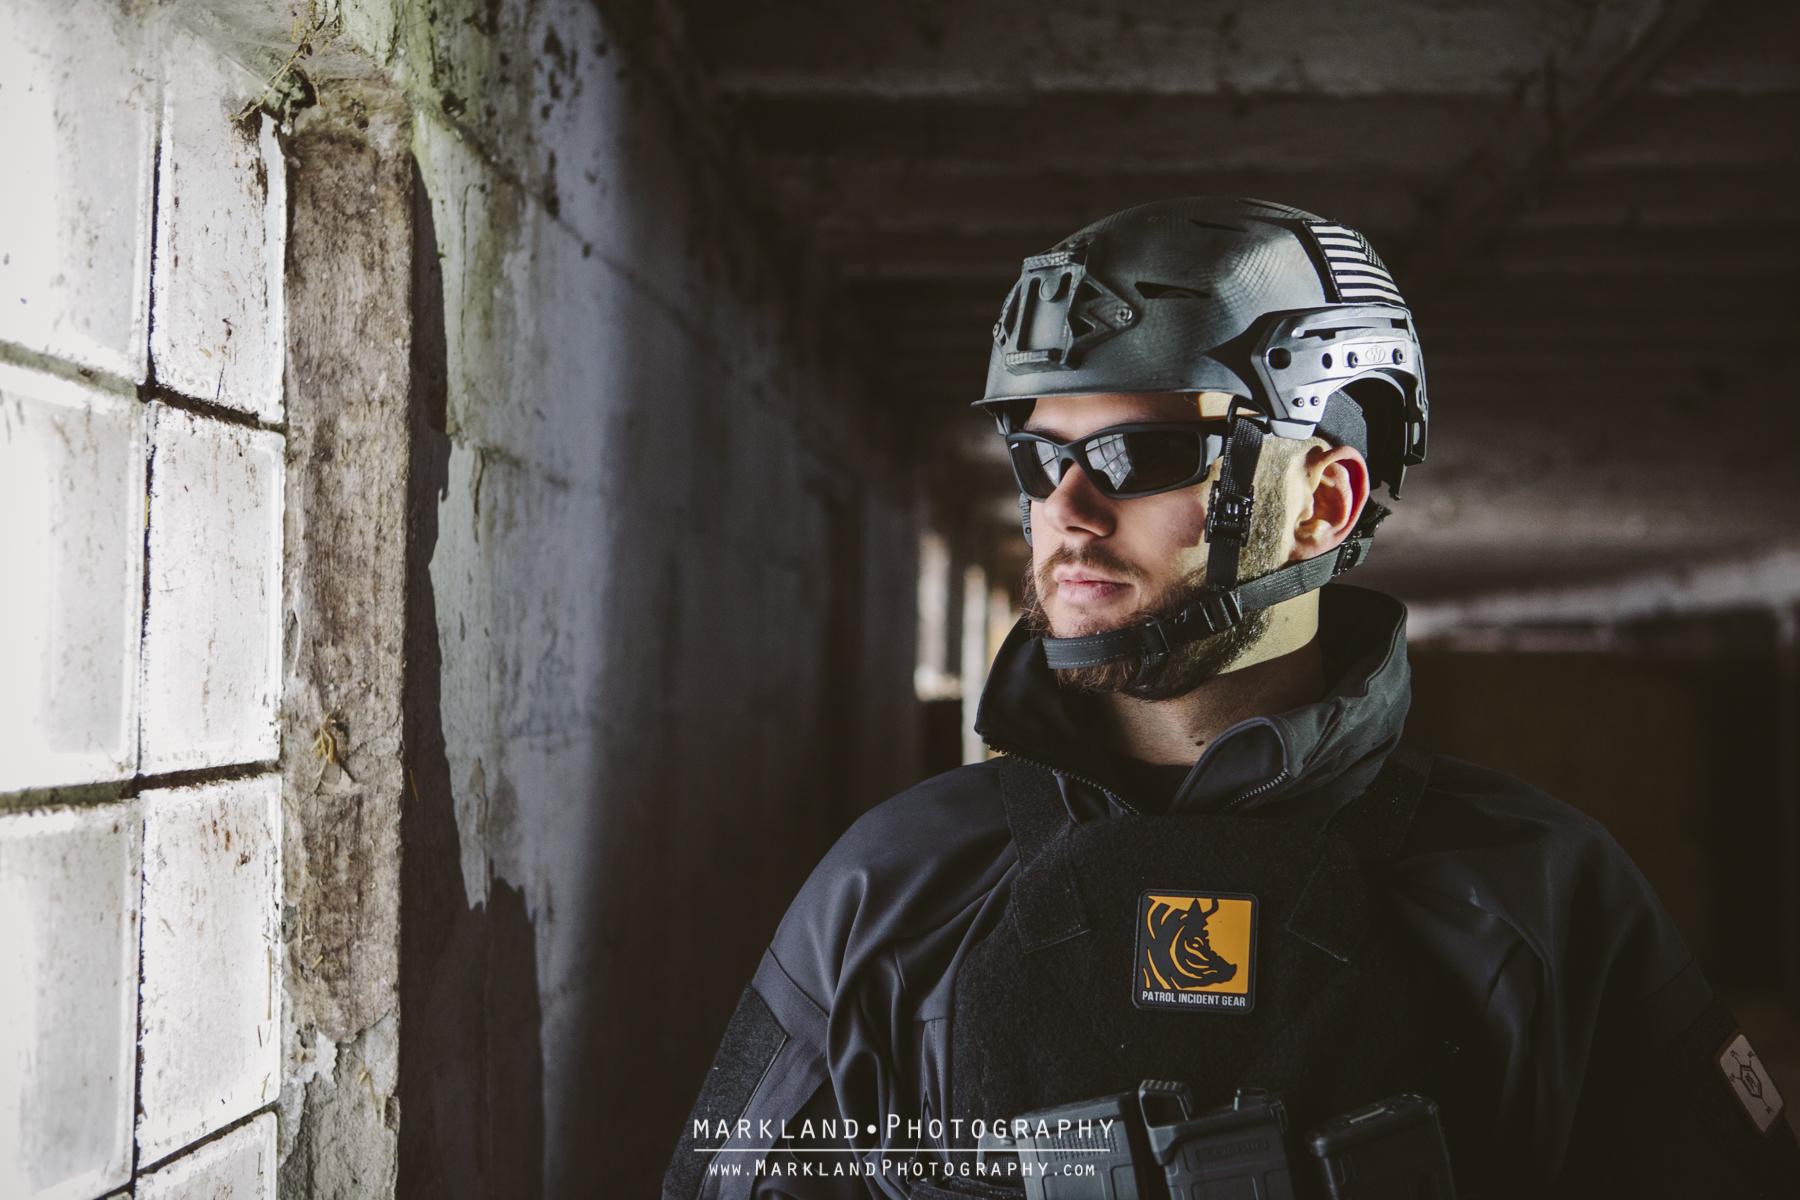 team wendy bump helmet skd tactical